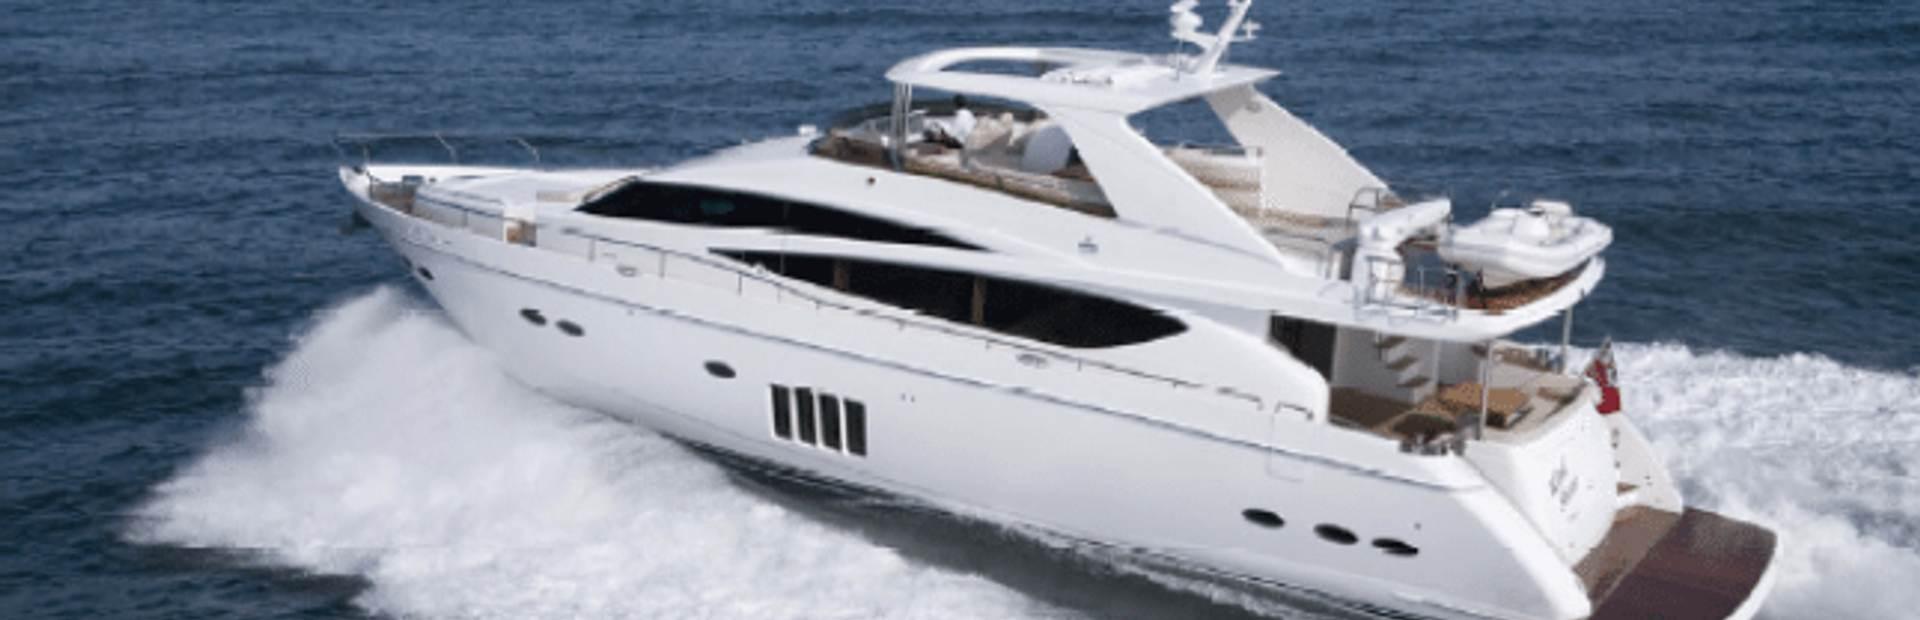 Princess 85 Motor Yacht Yacht Charter